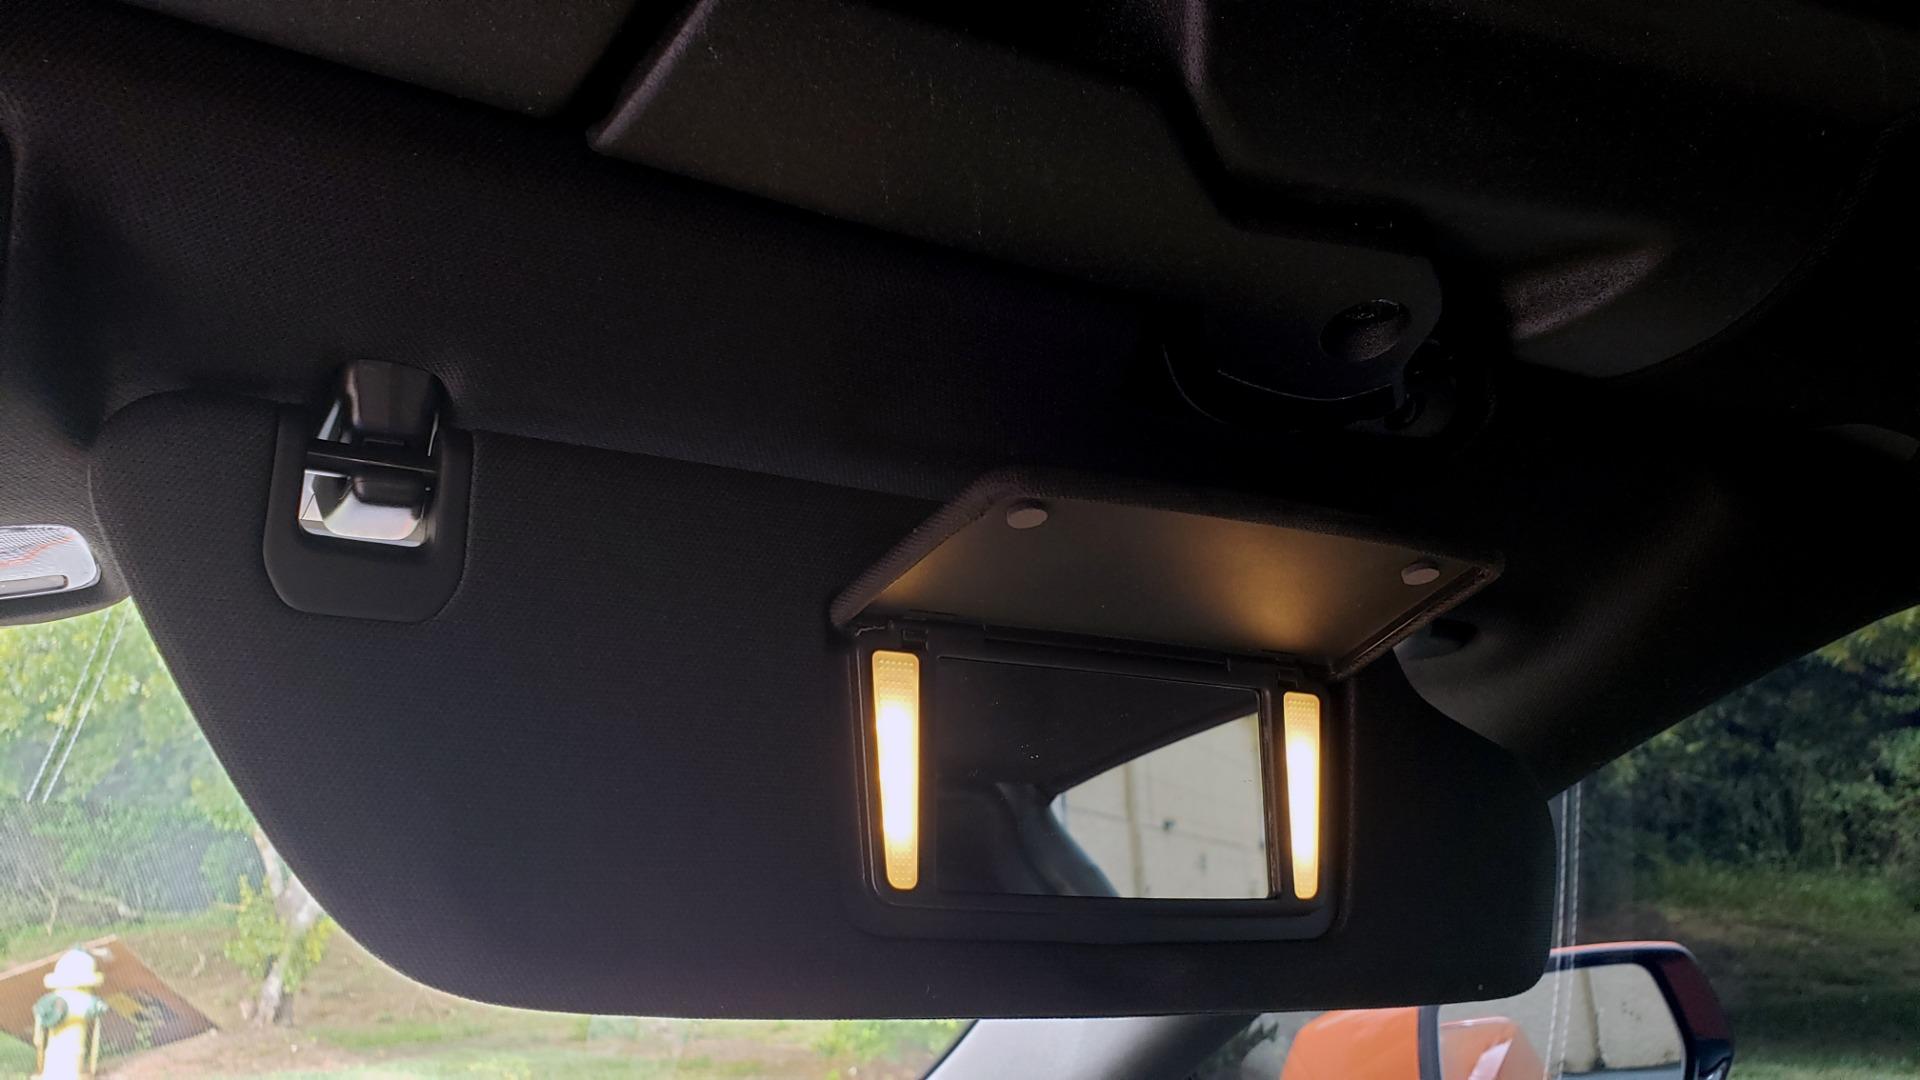 Used 2020 Chevrolet CORVETTE C8 STINGRAY 2LT / 6.2L V8 / 8-SPD AUTO / NAV / BOSE / REARVIEW / DATA RECOR for sale Sold at Formula Imports in Charlotte NC 28227 69